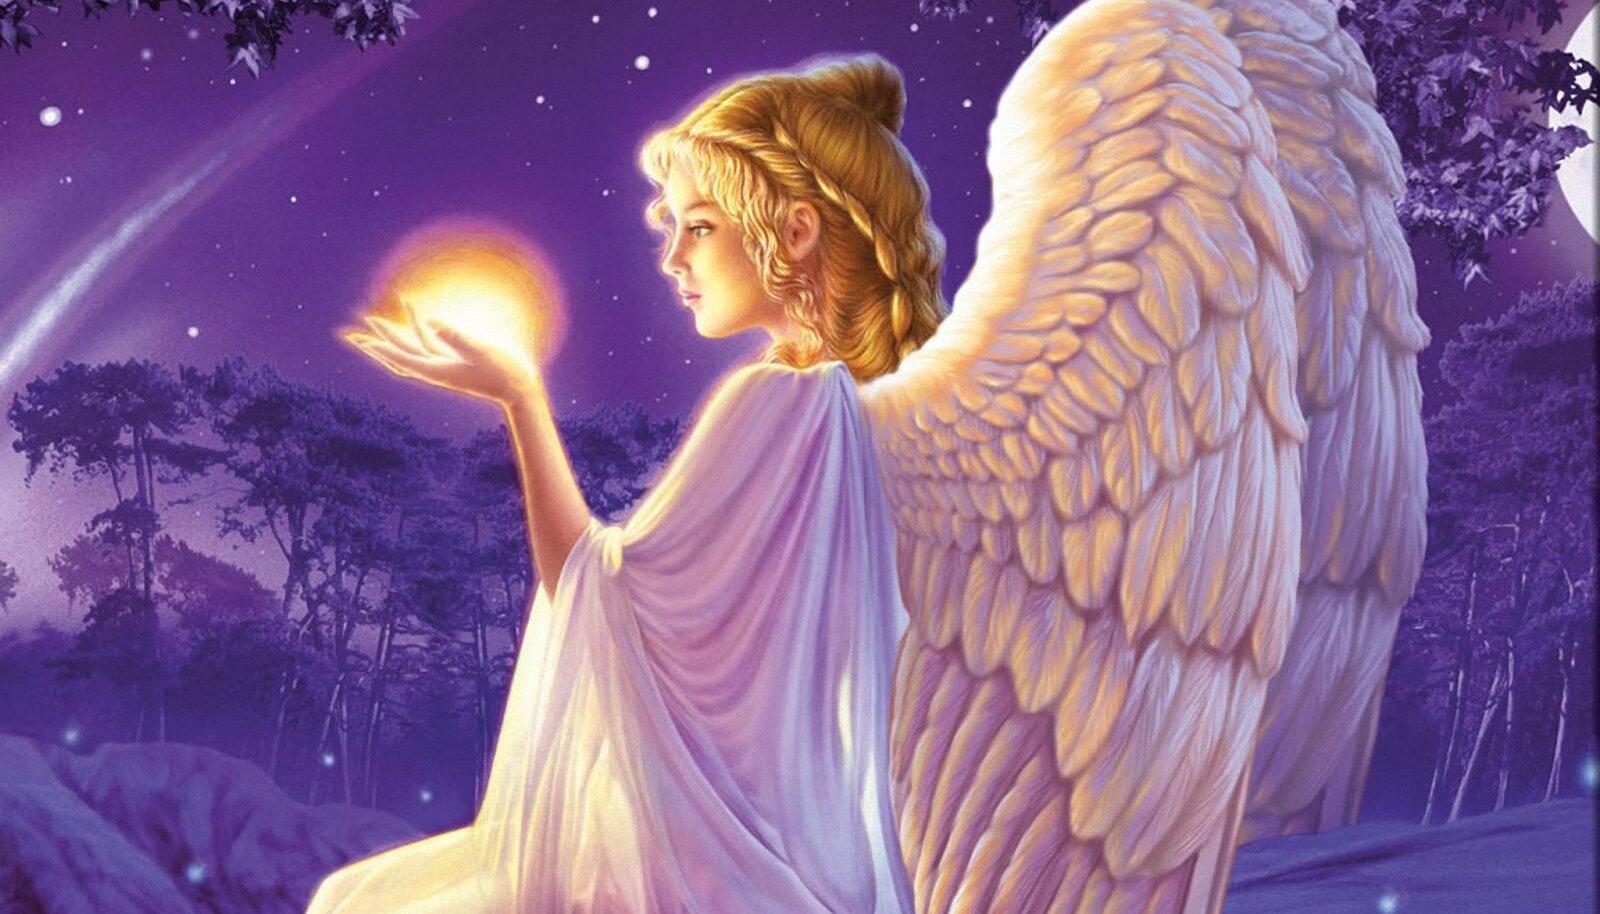 Lase inglitel end aidata